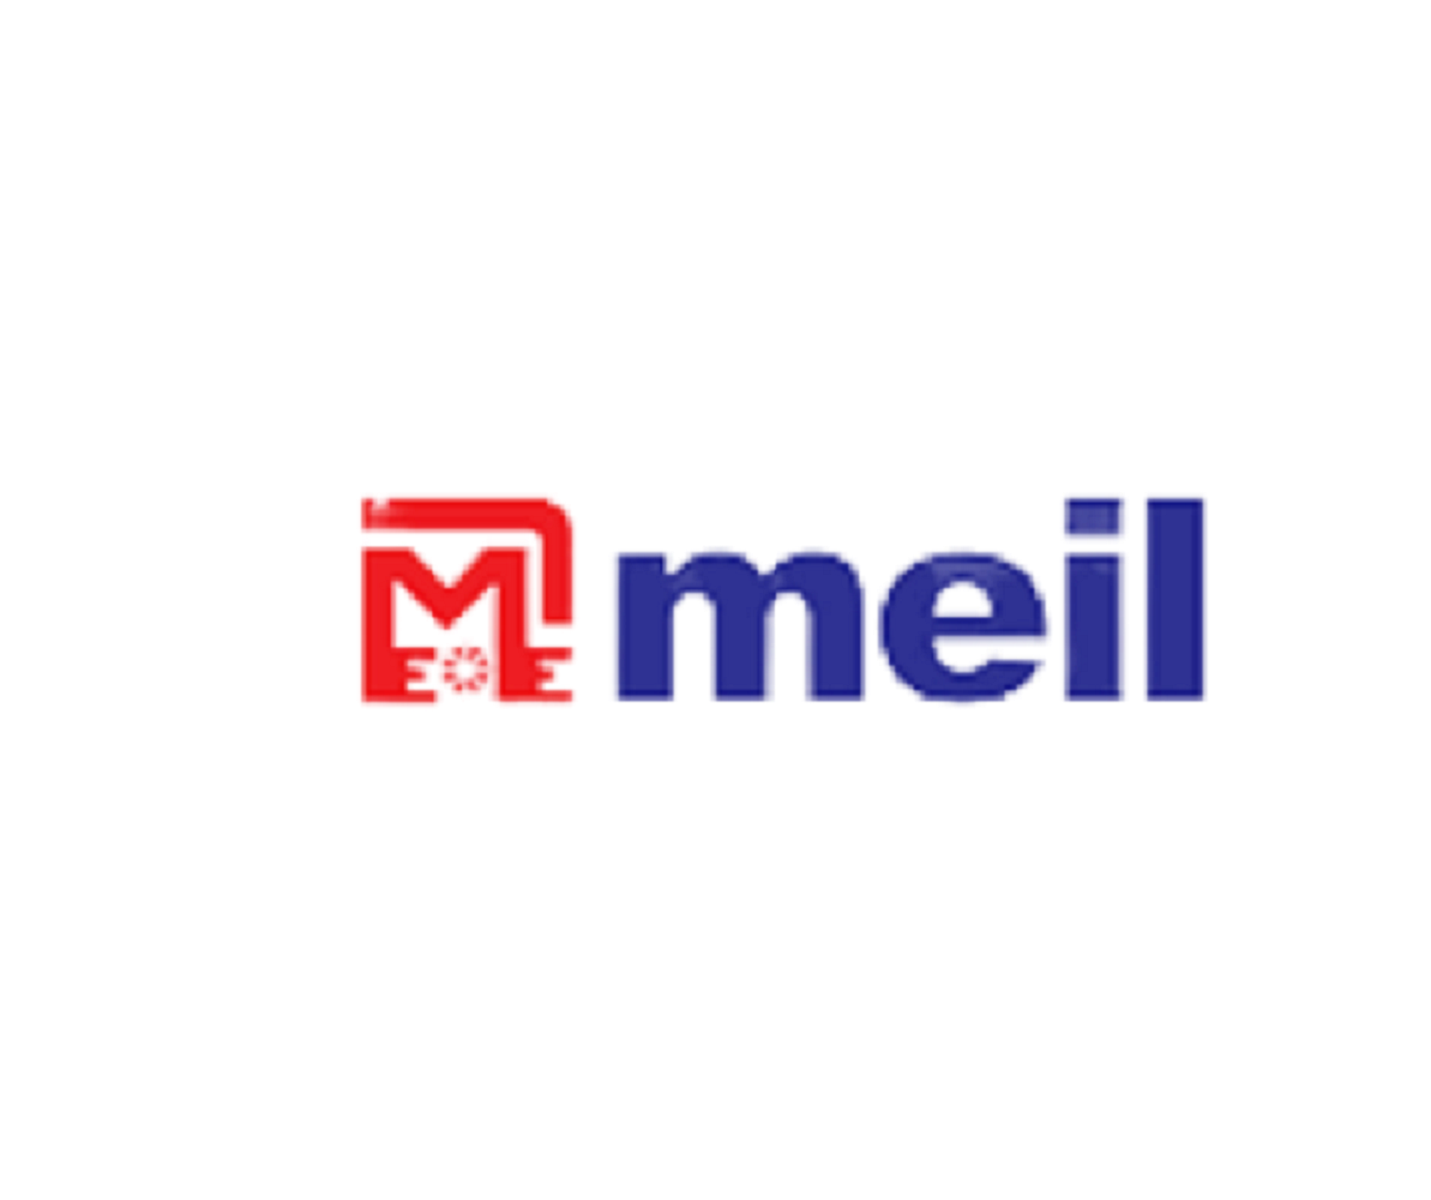 meil-removebg-preview